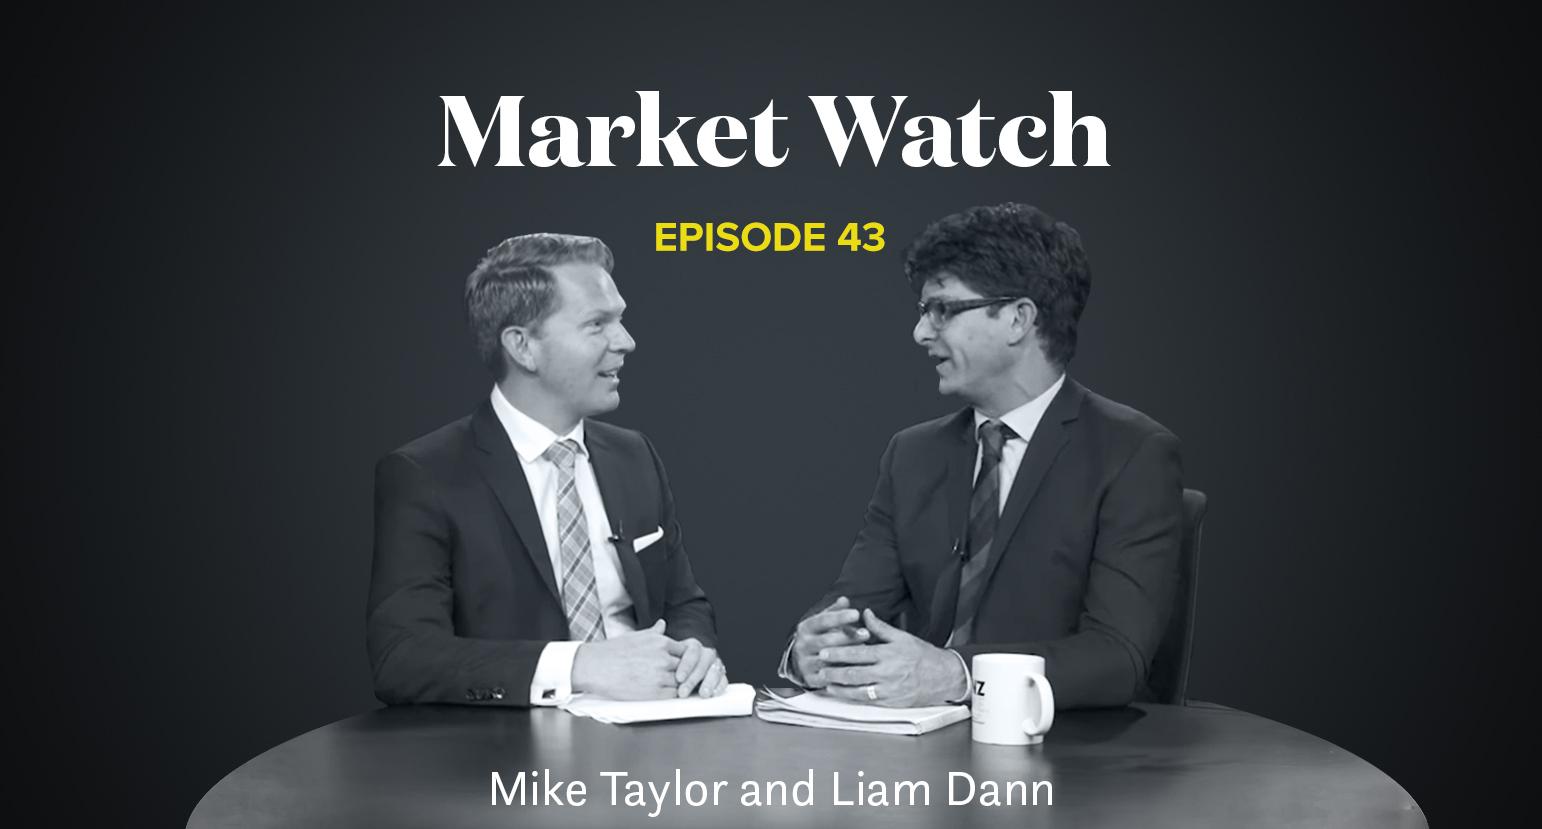 Market-Watch-Video-and-EP43_Digital-1.jpg